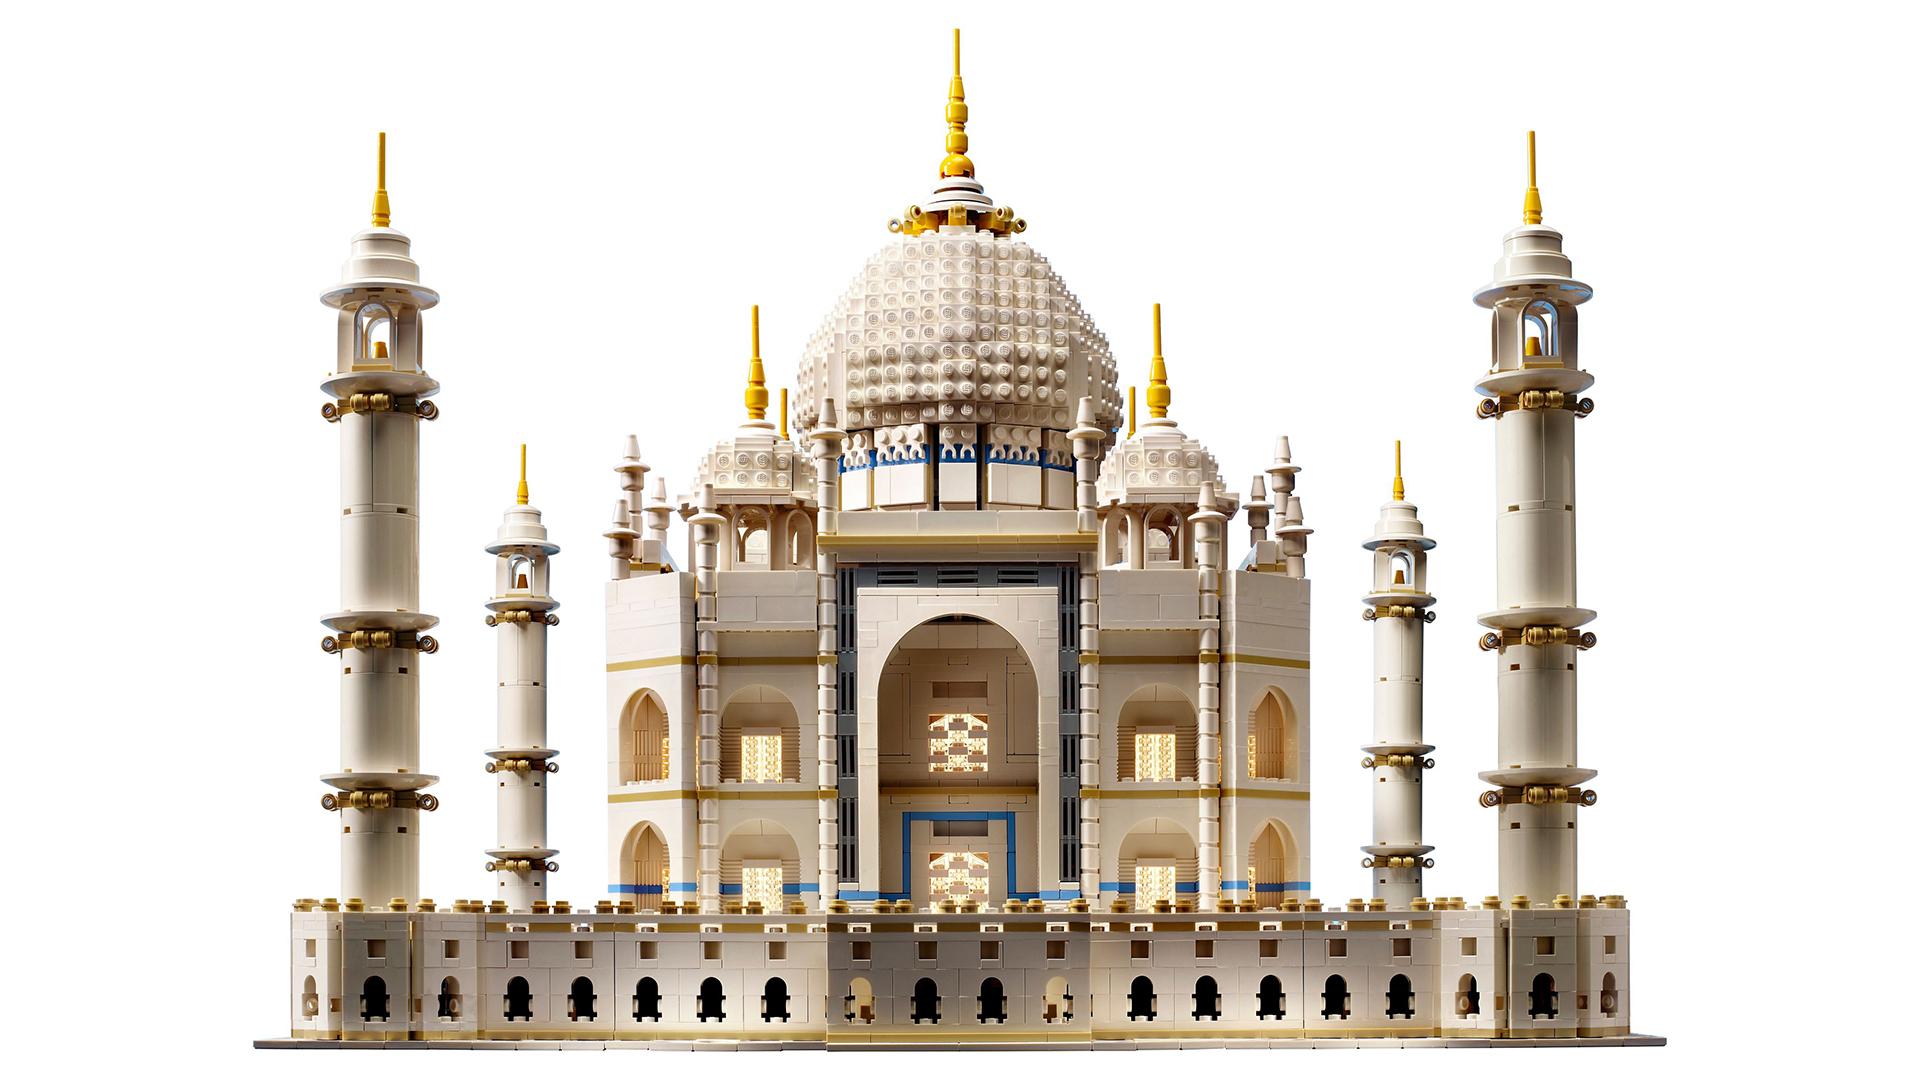 Best Lego Architecture sets: Taj Mahal